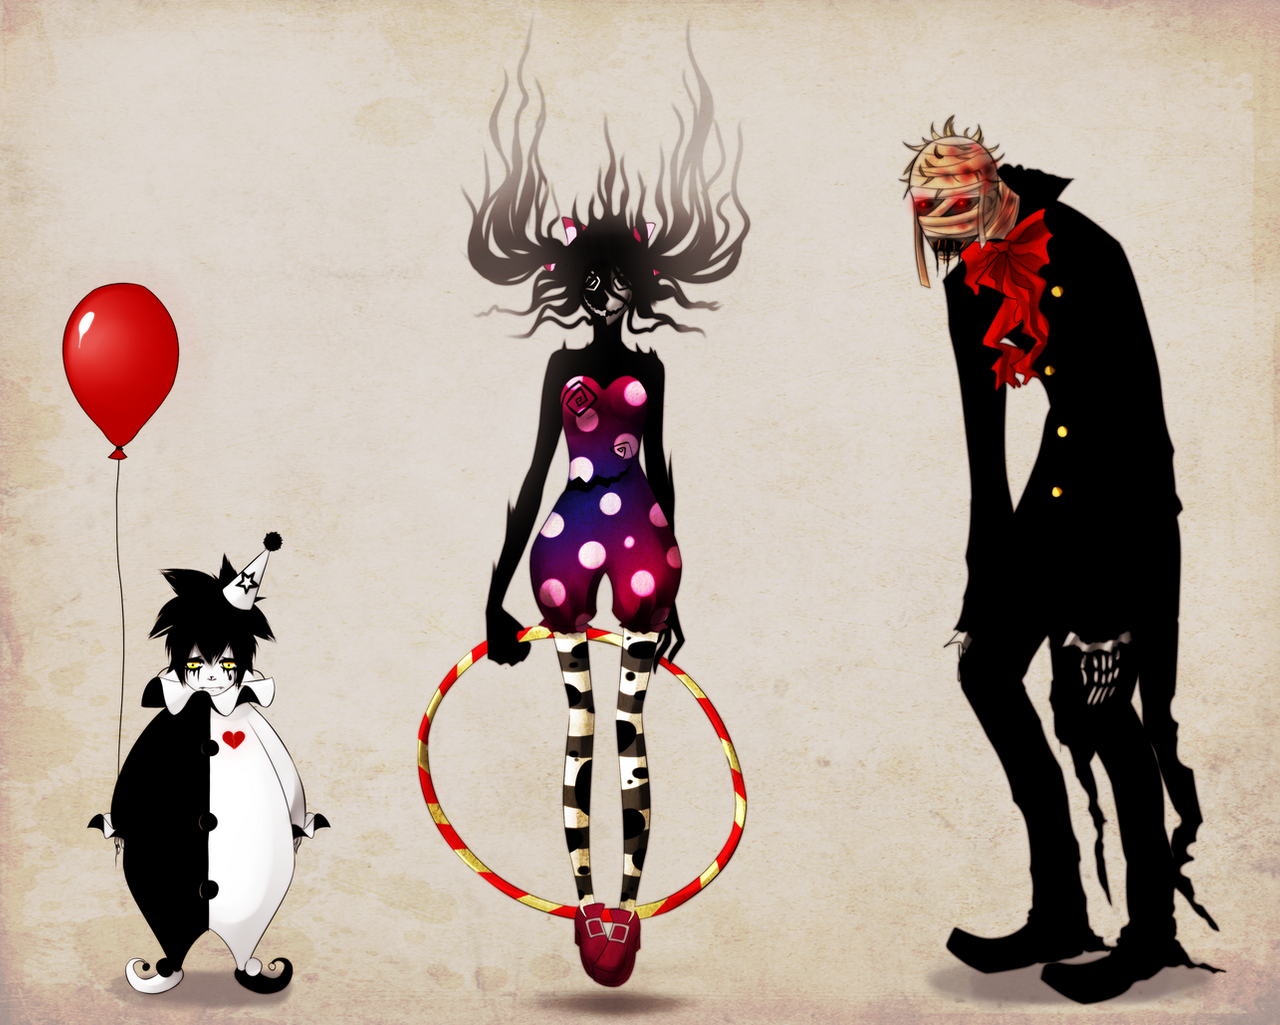 circus team by Naimane on DeviantArt